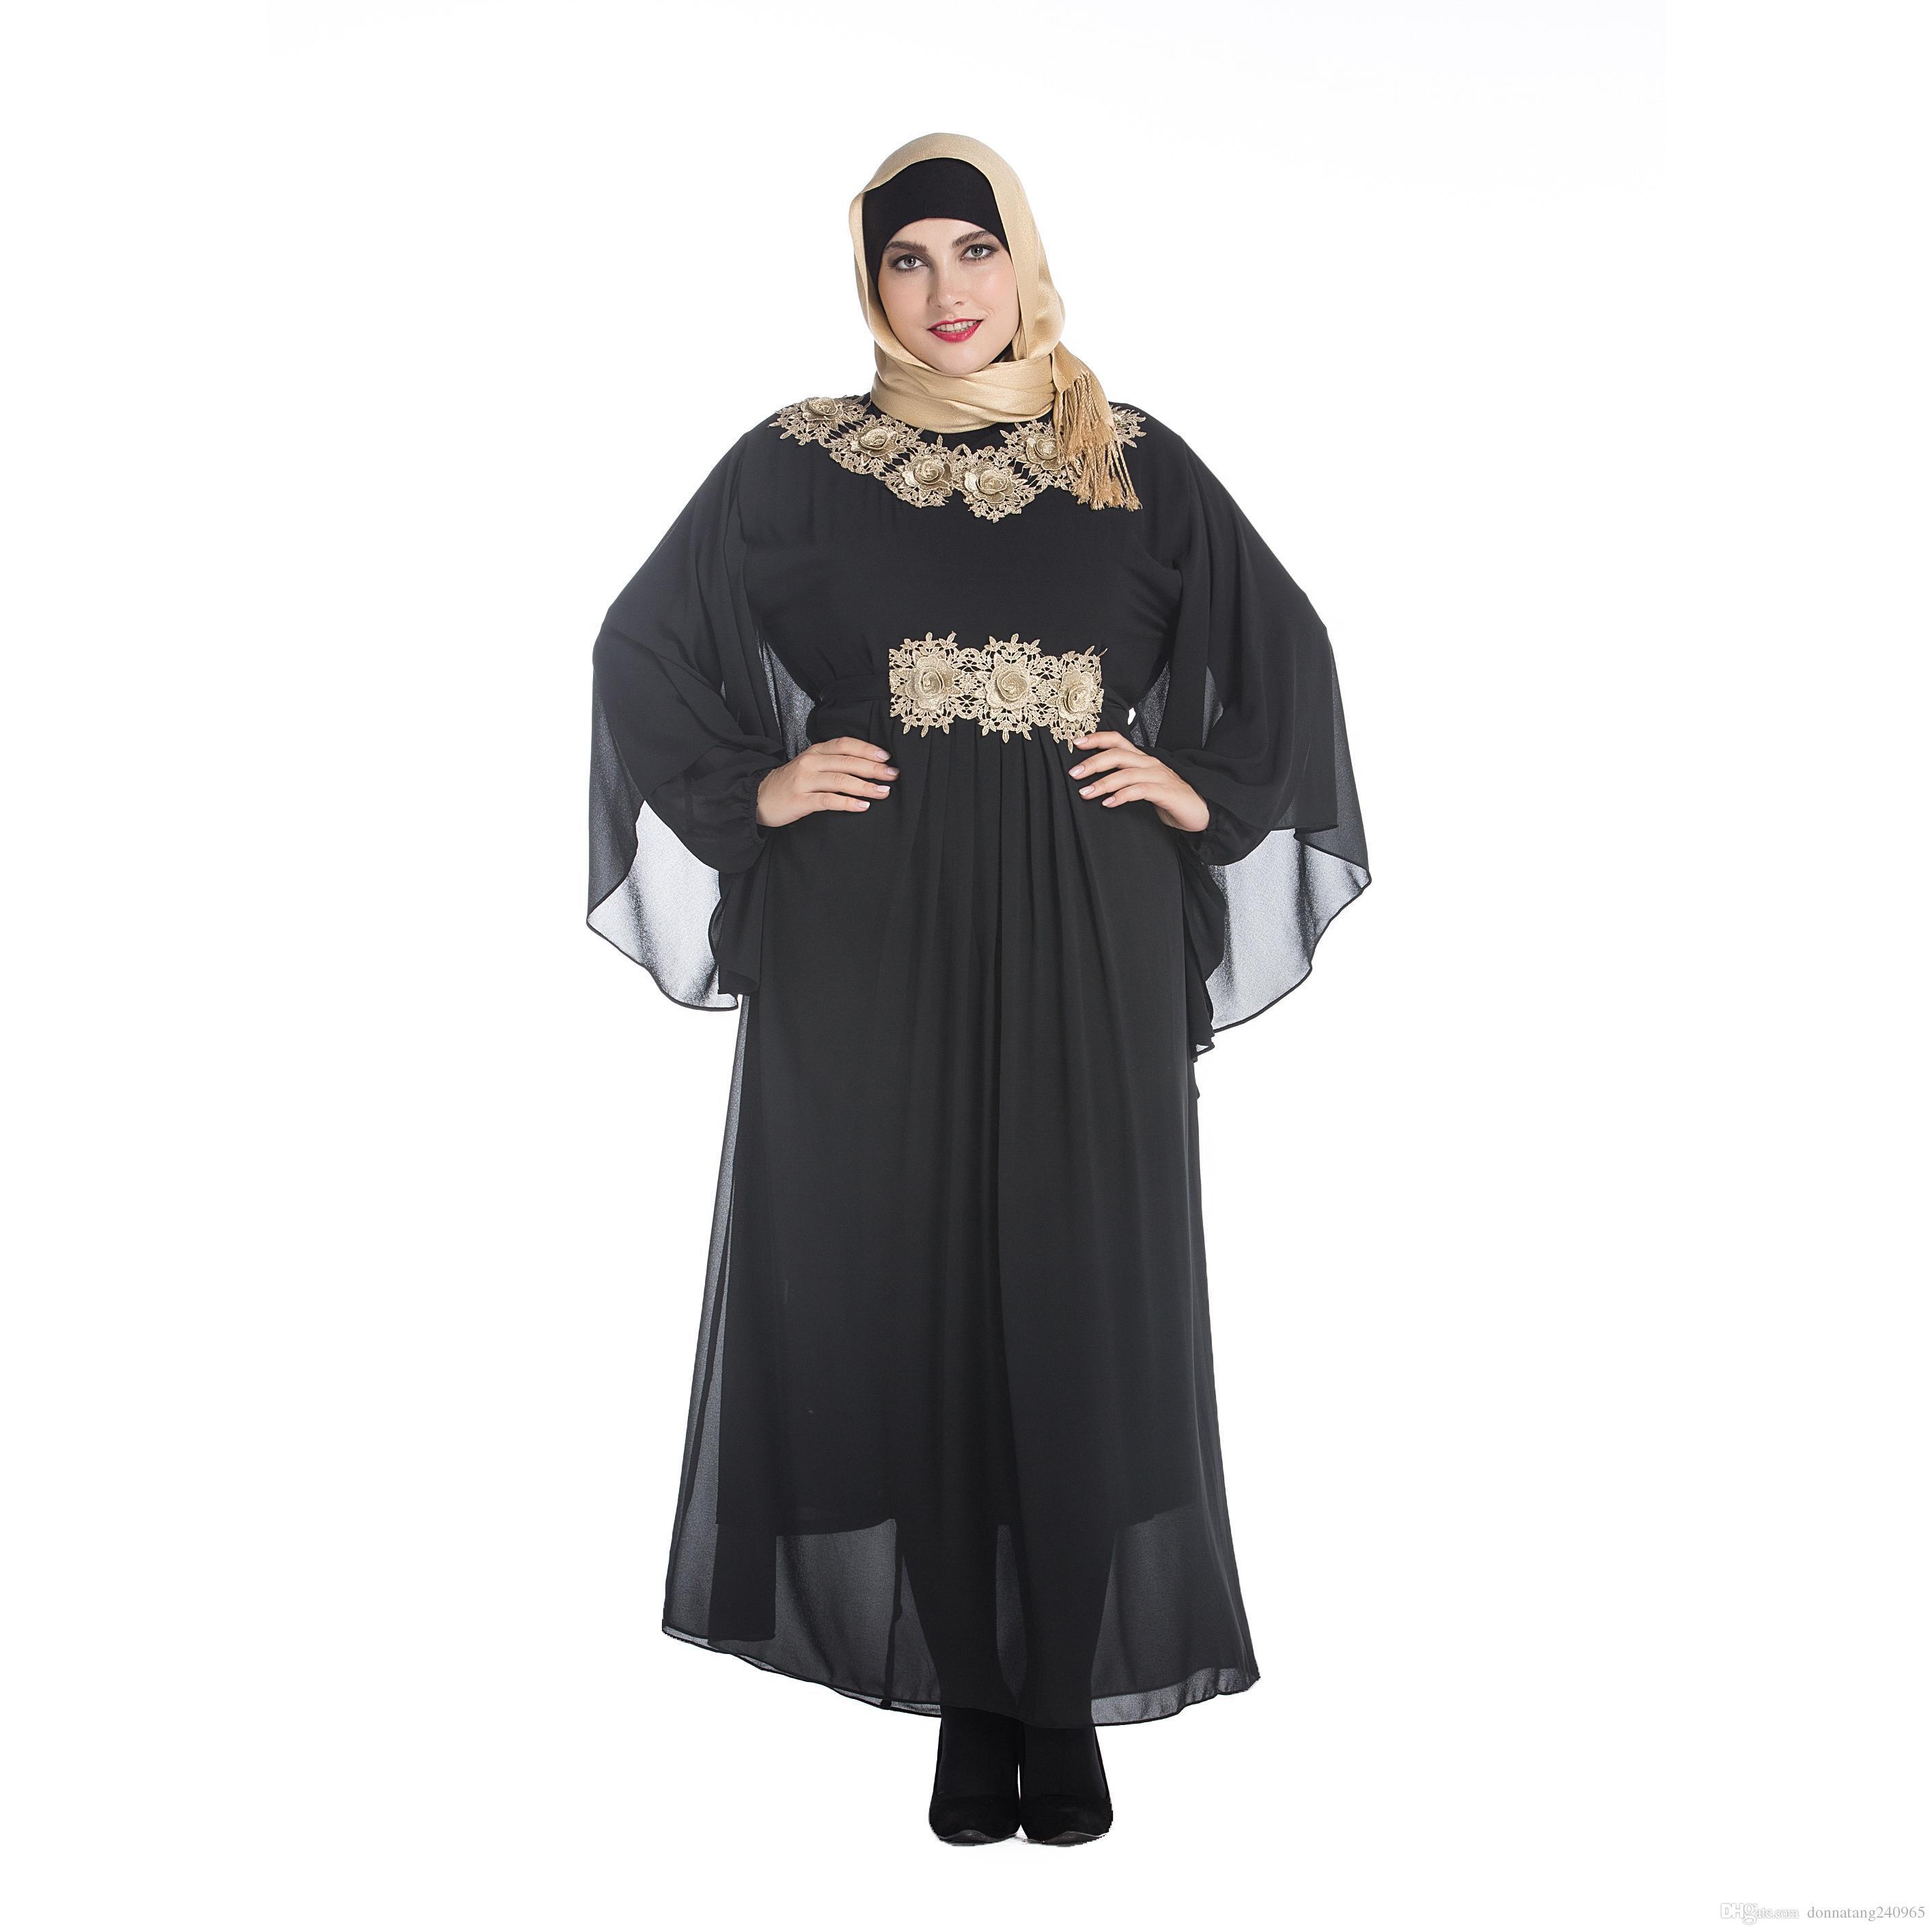 44c64c1a294 Tamanho grande Gordura Mulheres Roupas Decalques Muçulmanos Malásia Árabe  Vestes Oriente Médio Feminino Morcegos Manga Longa Plus Size Vestido Maxi  Bordado ...